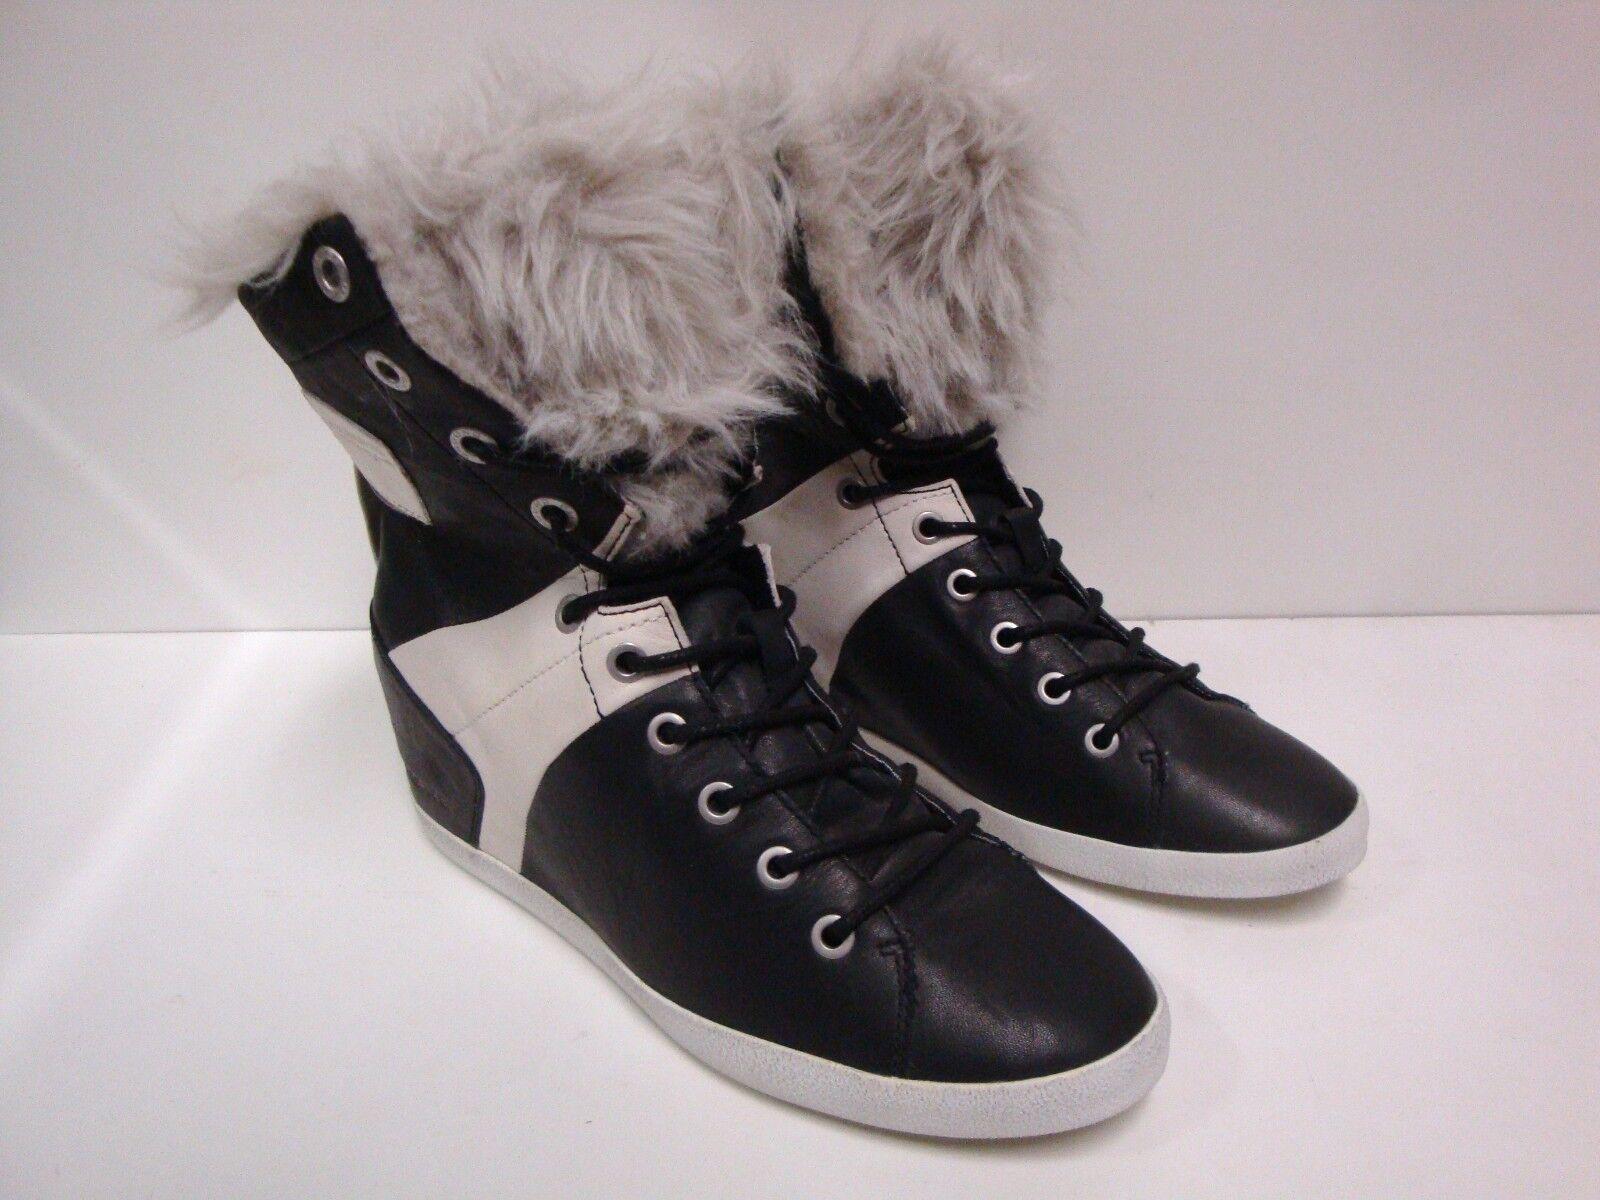 Gran descuento Barato y cómodo 1 paire de chaussures femme Groundfive taille 39 NEUVE